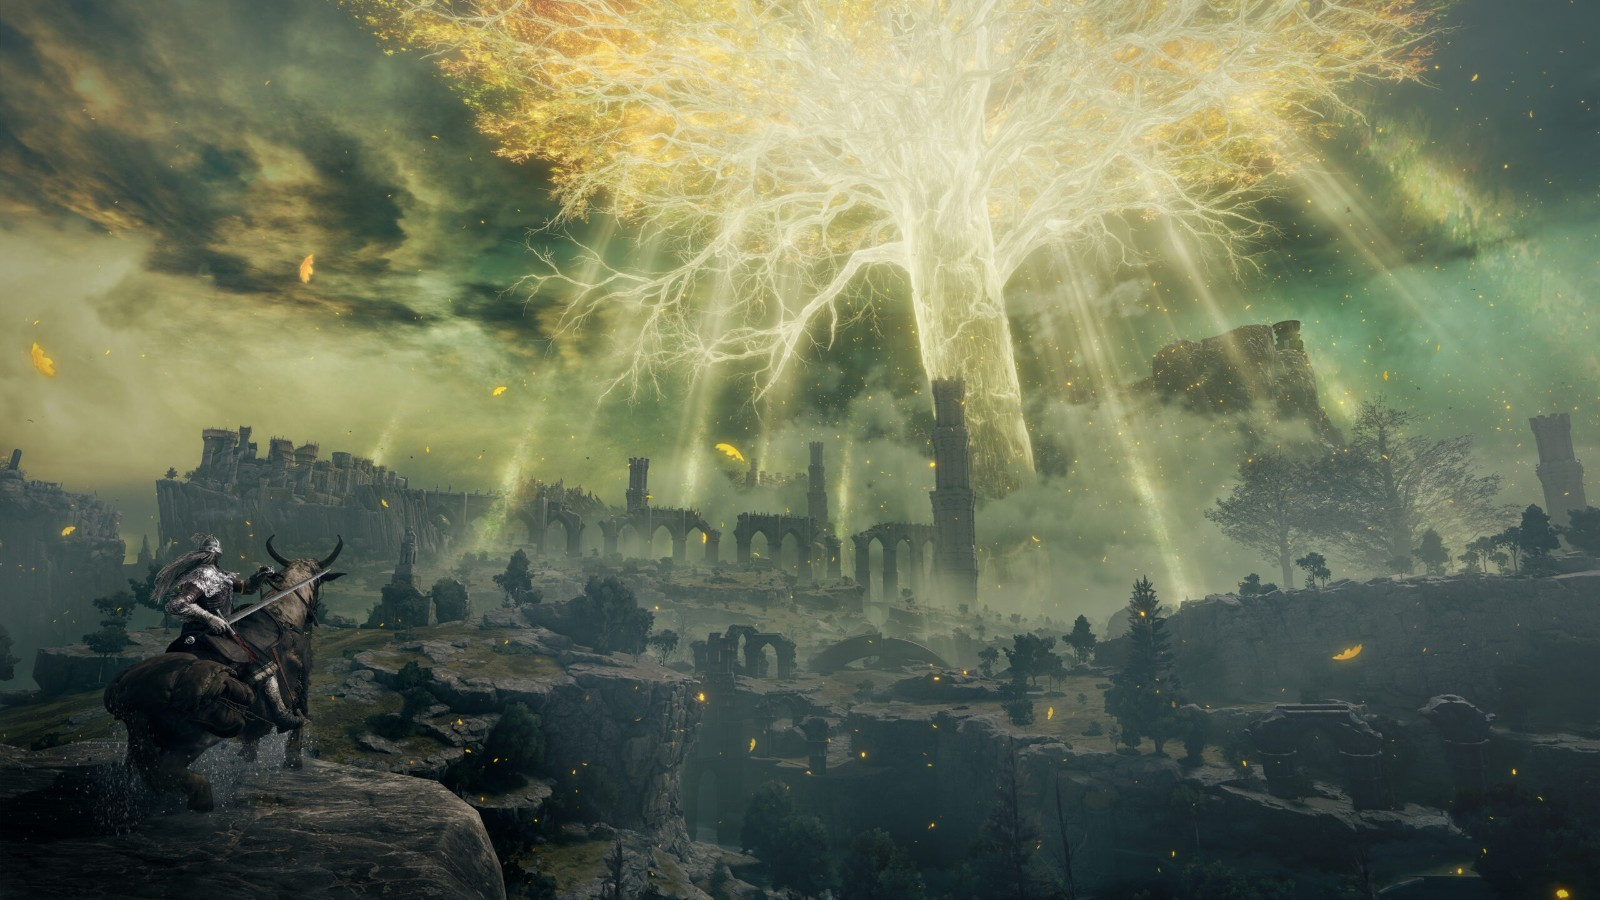 《Elden Ring》官方剧情及玩法介绍 新截图公布